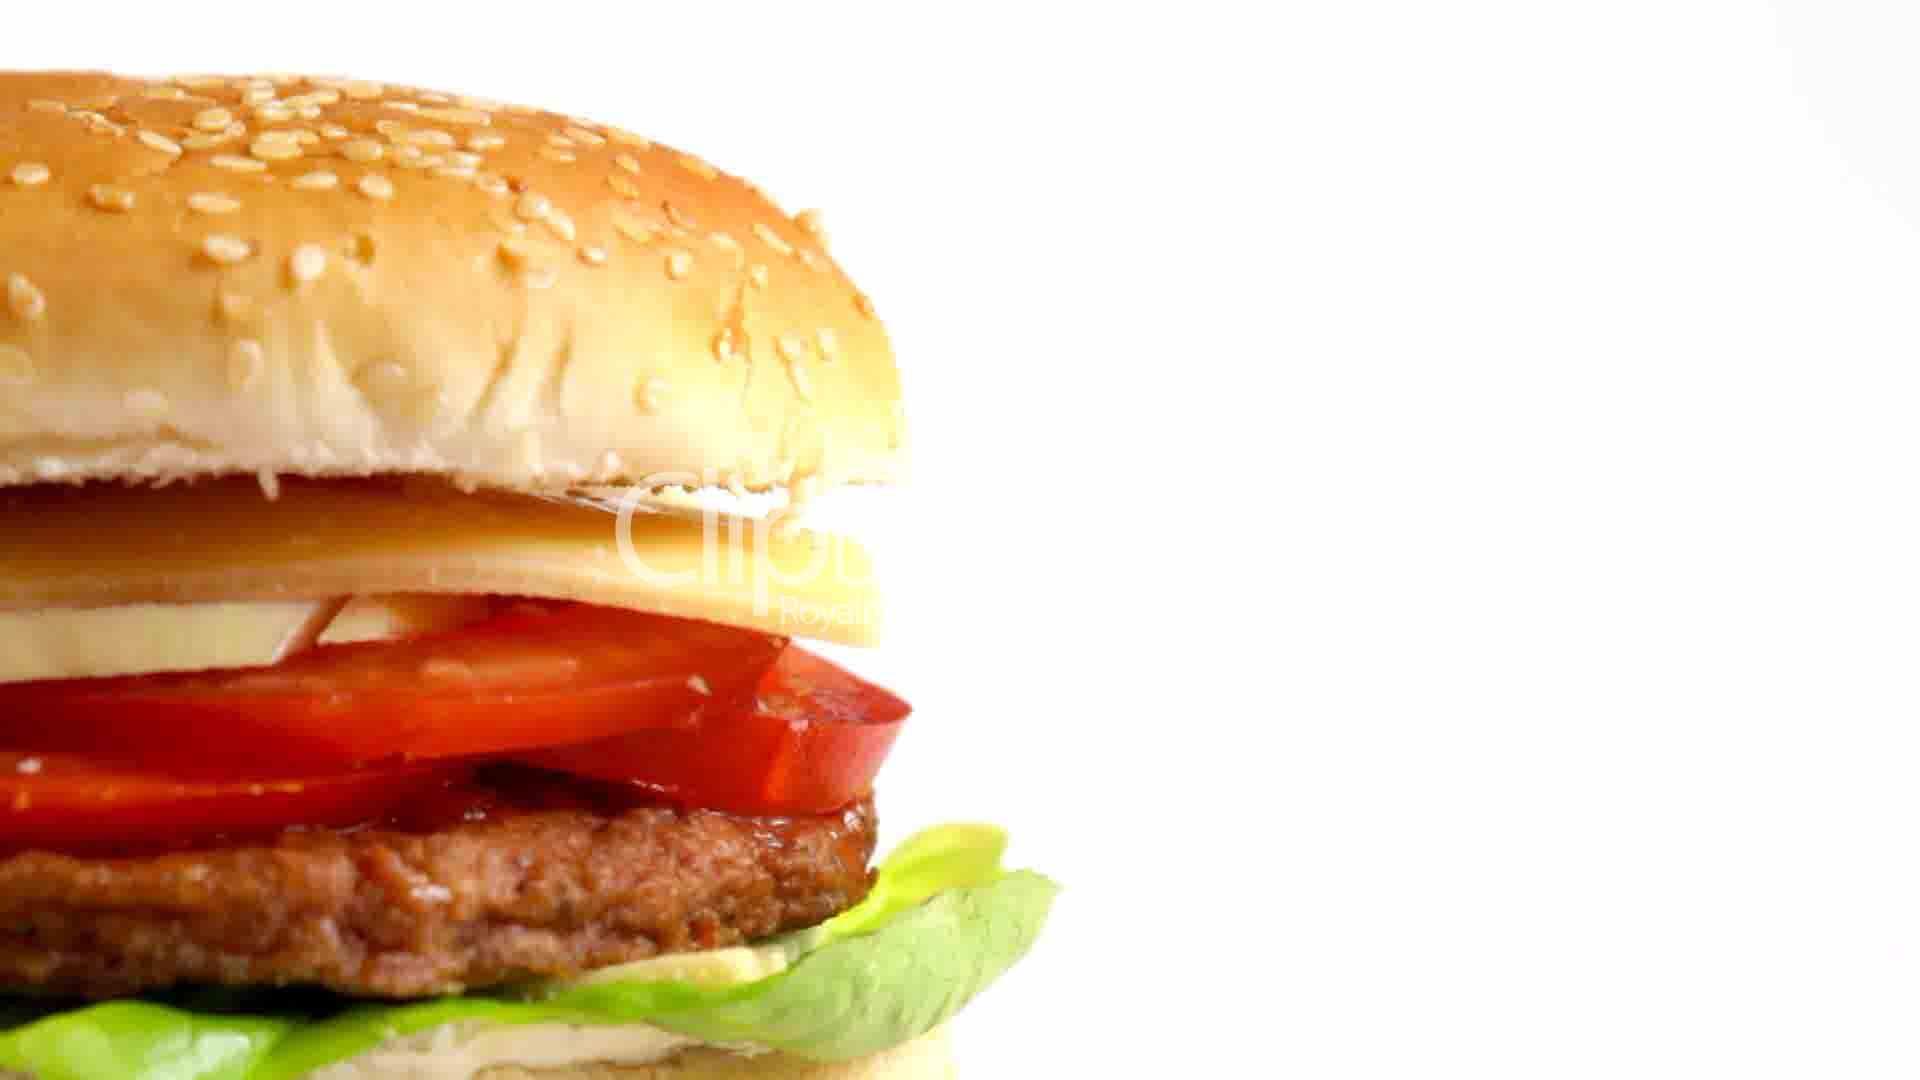 Hamburger Background 42081 4000x2483 px